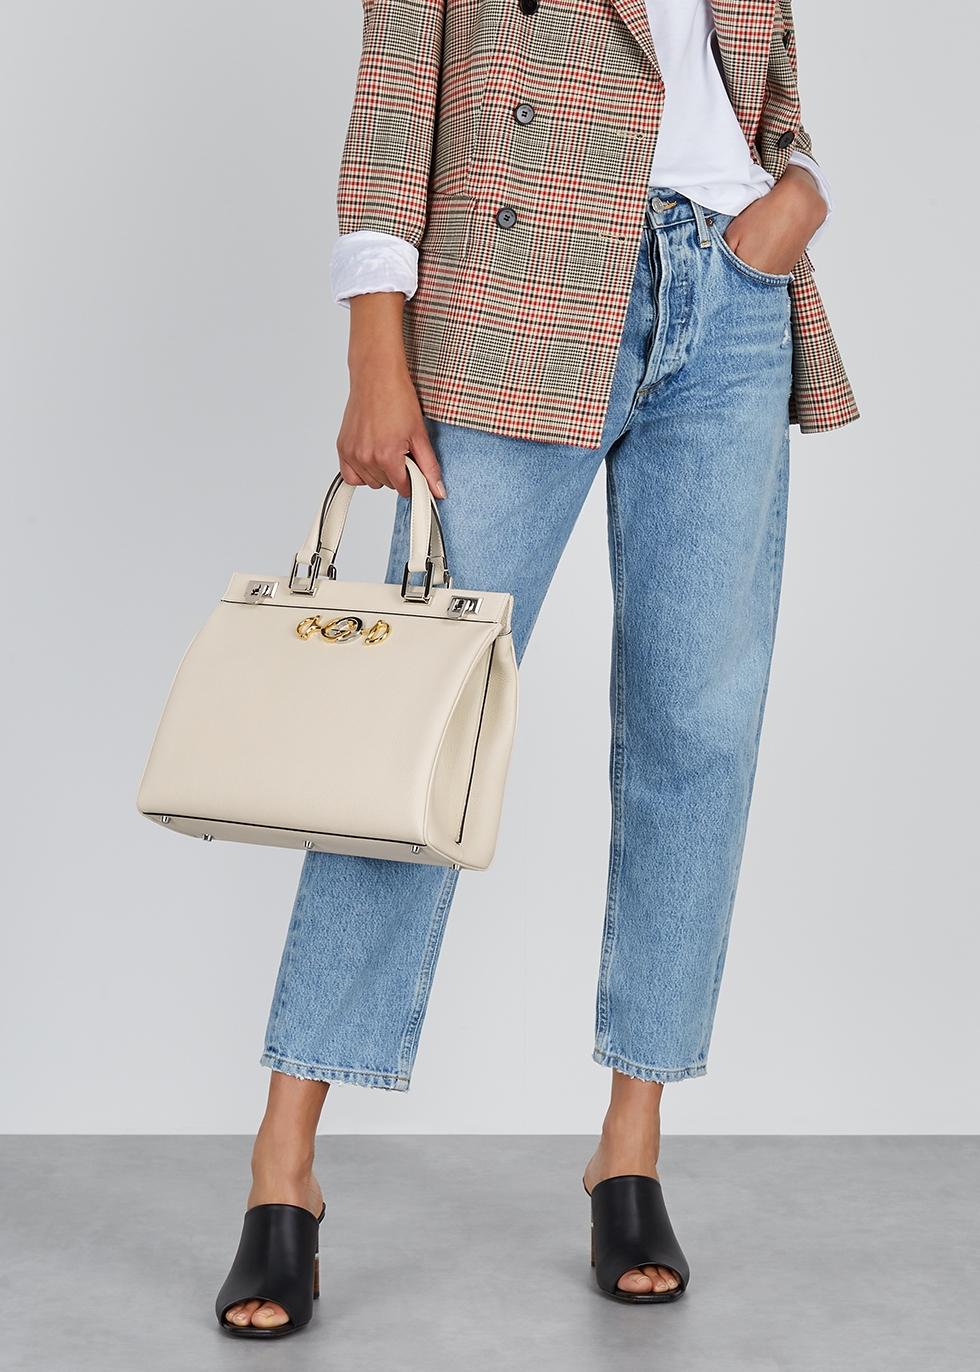 Zumi medium leather top handle bag - Gucci